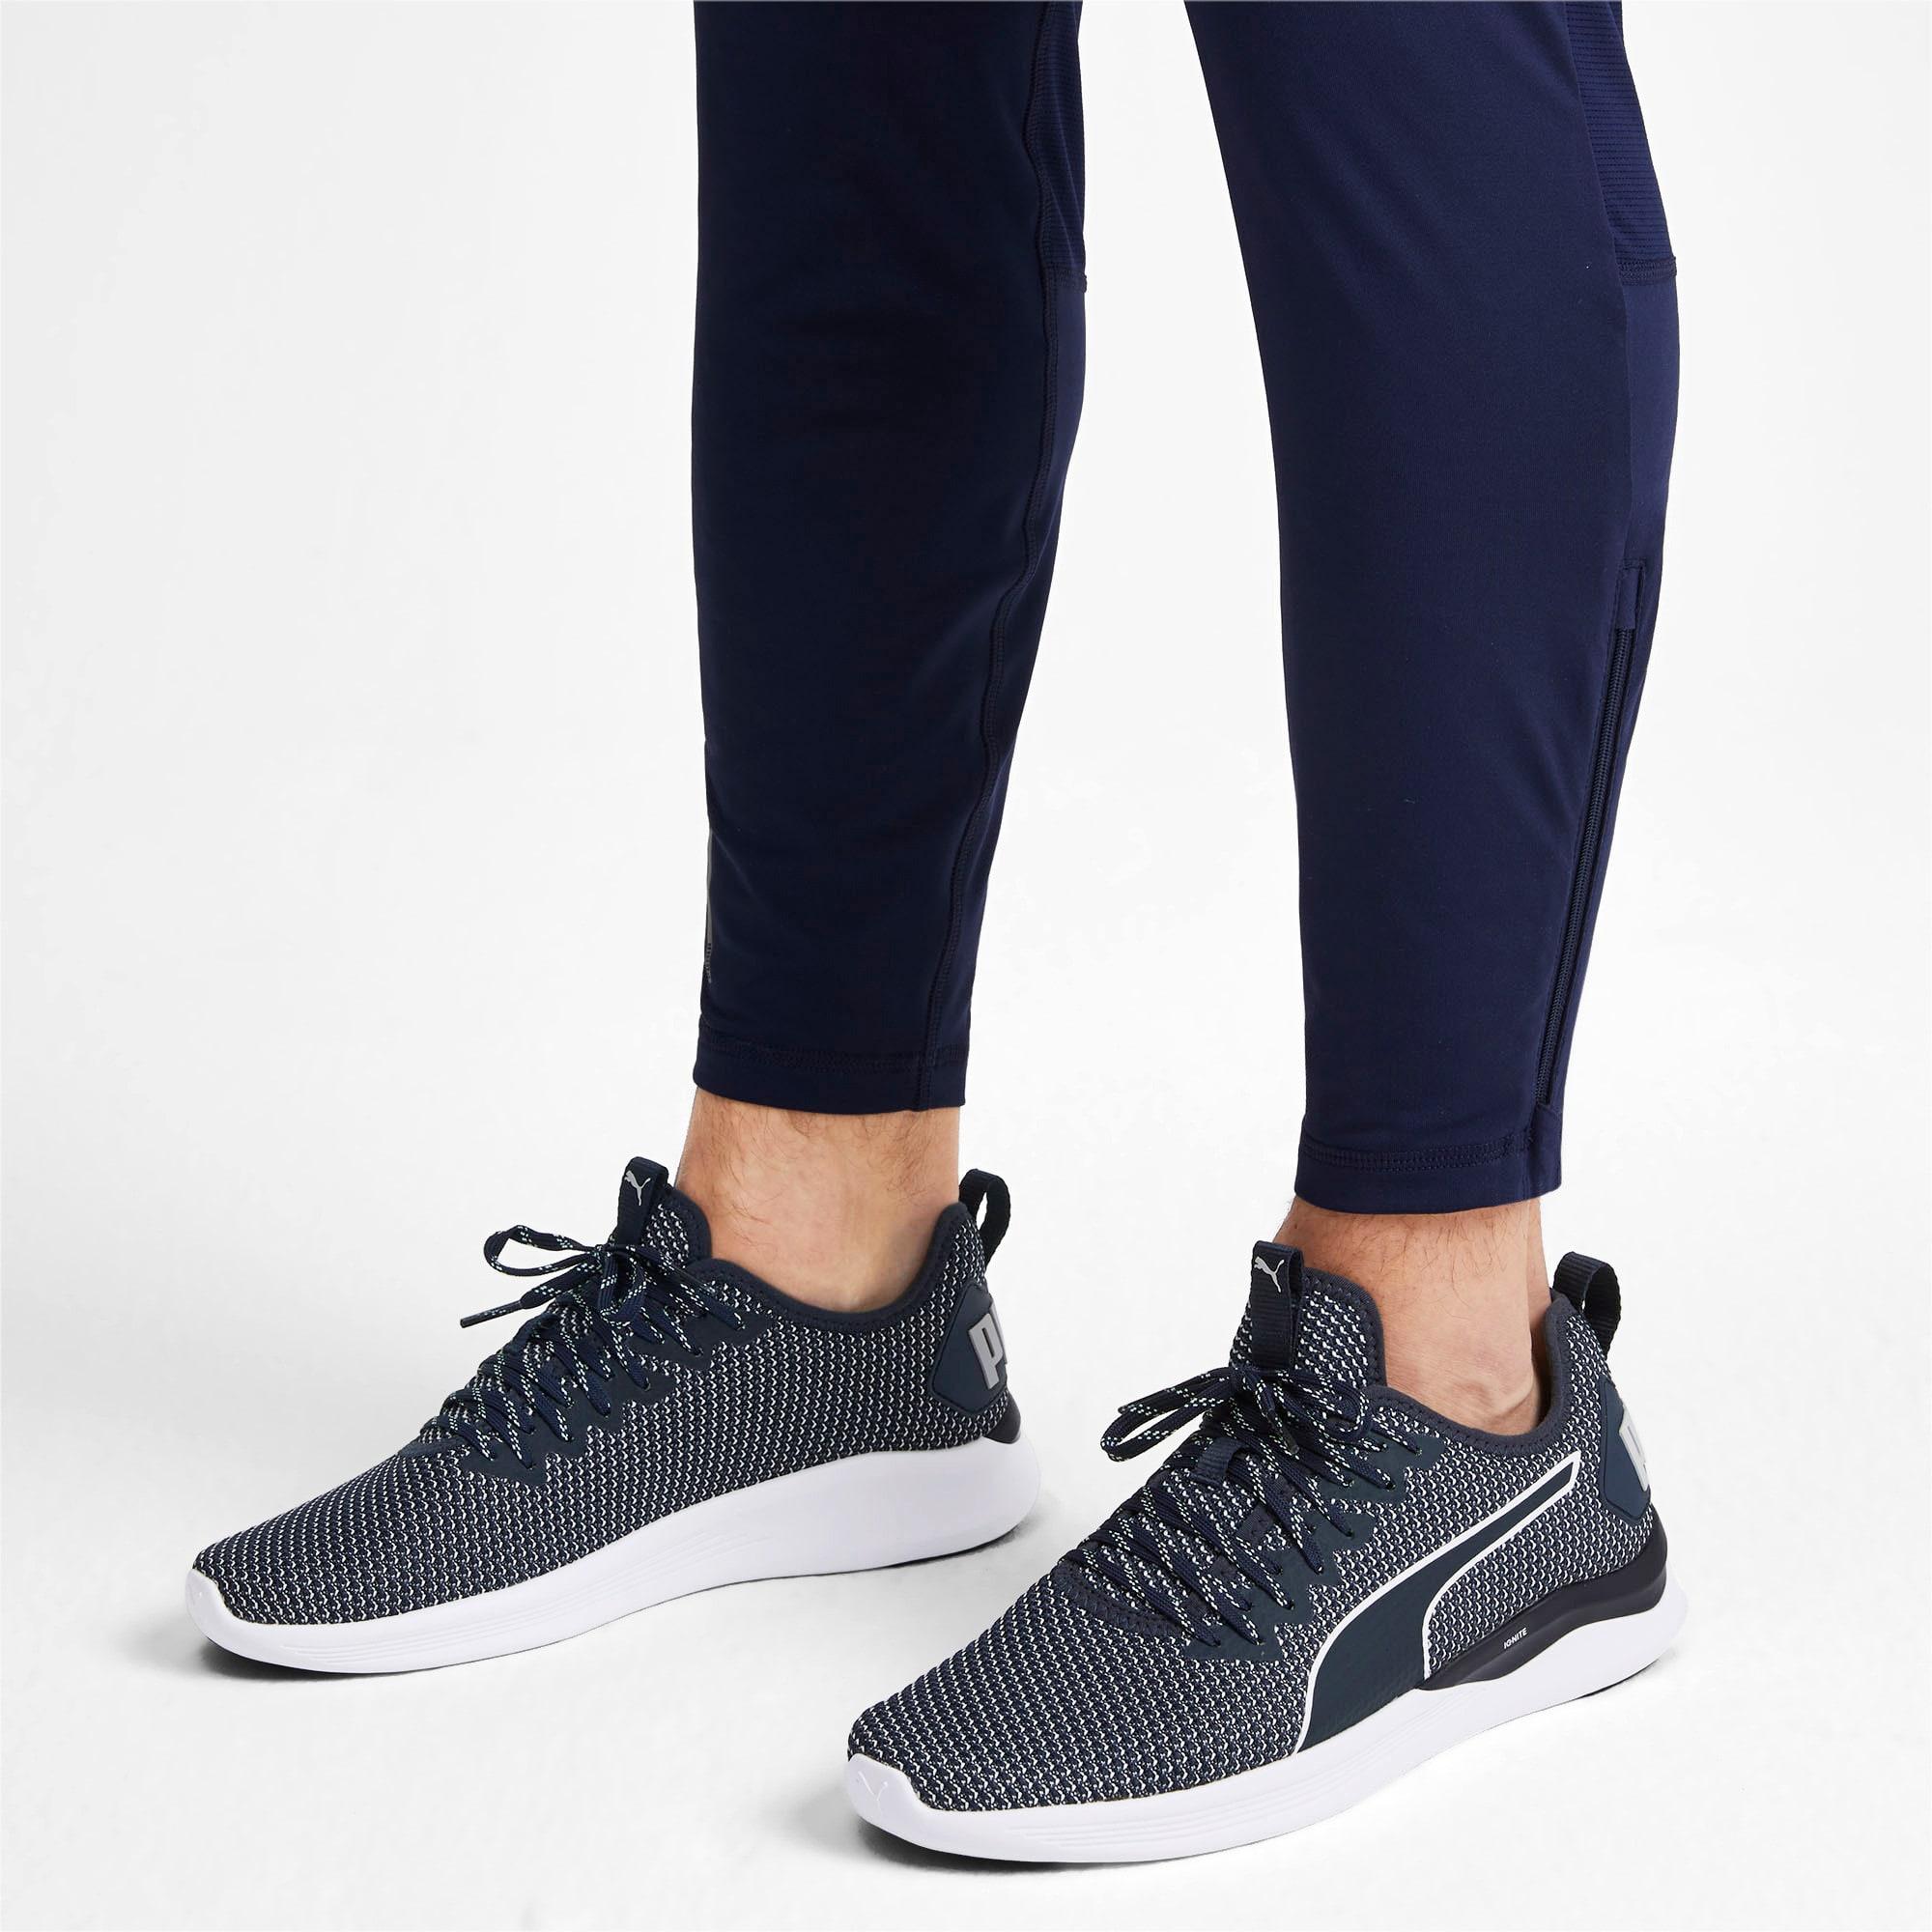 Thumbnail 2 of IGNITE Flash FS Men's Running Shoes, Peacoat-Glacier Gray-White, medium-IND